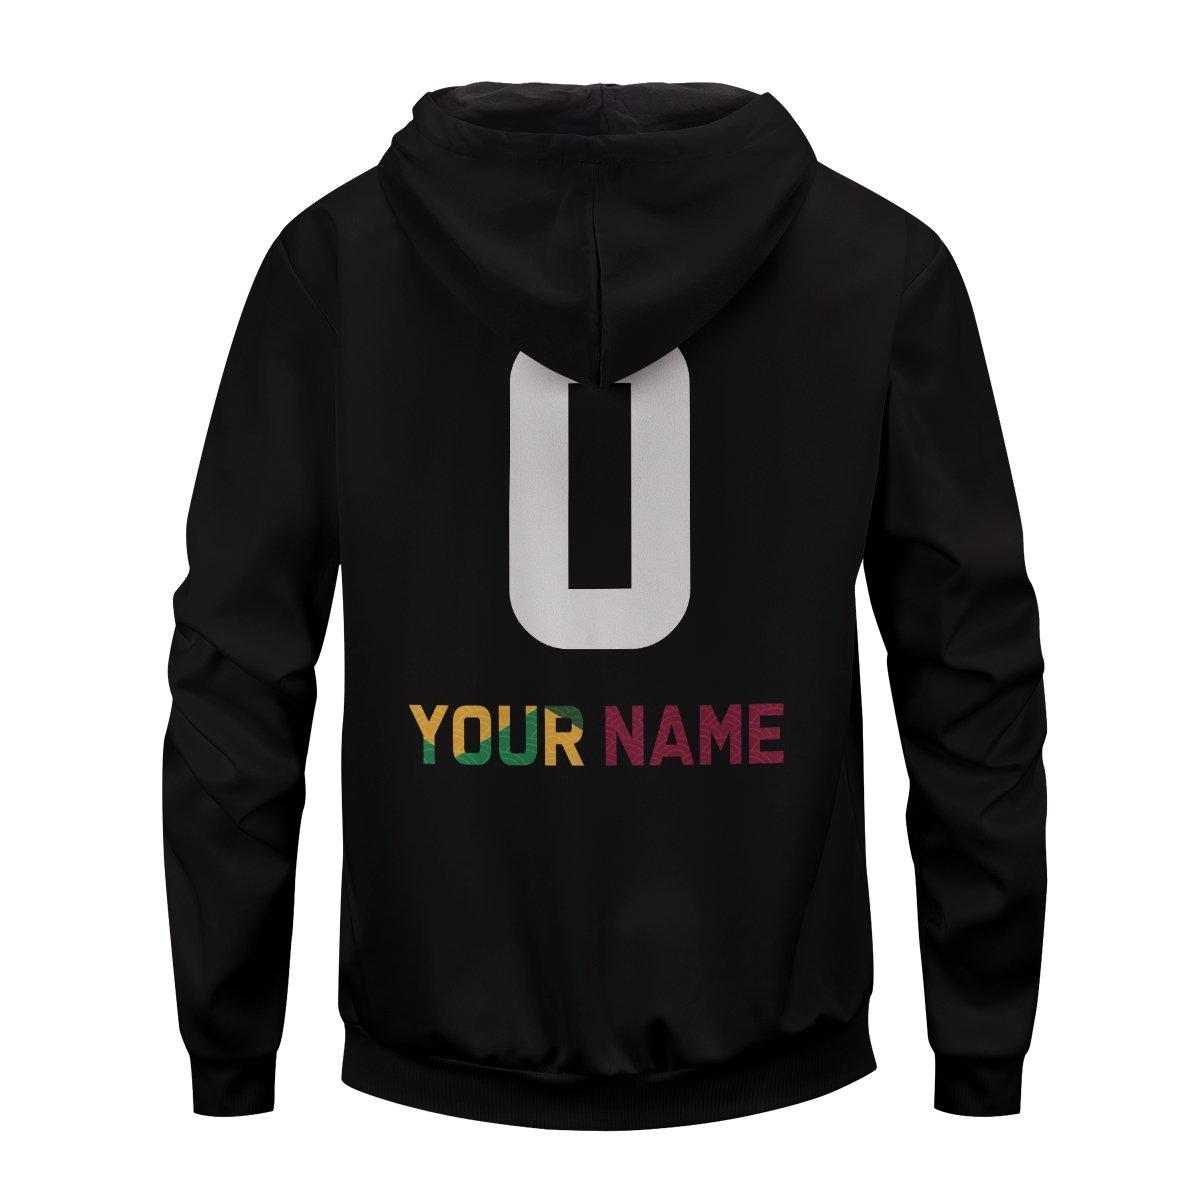 personalized tomioka giyu unisex zipped hoodie 592953 - Otaku Treat